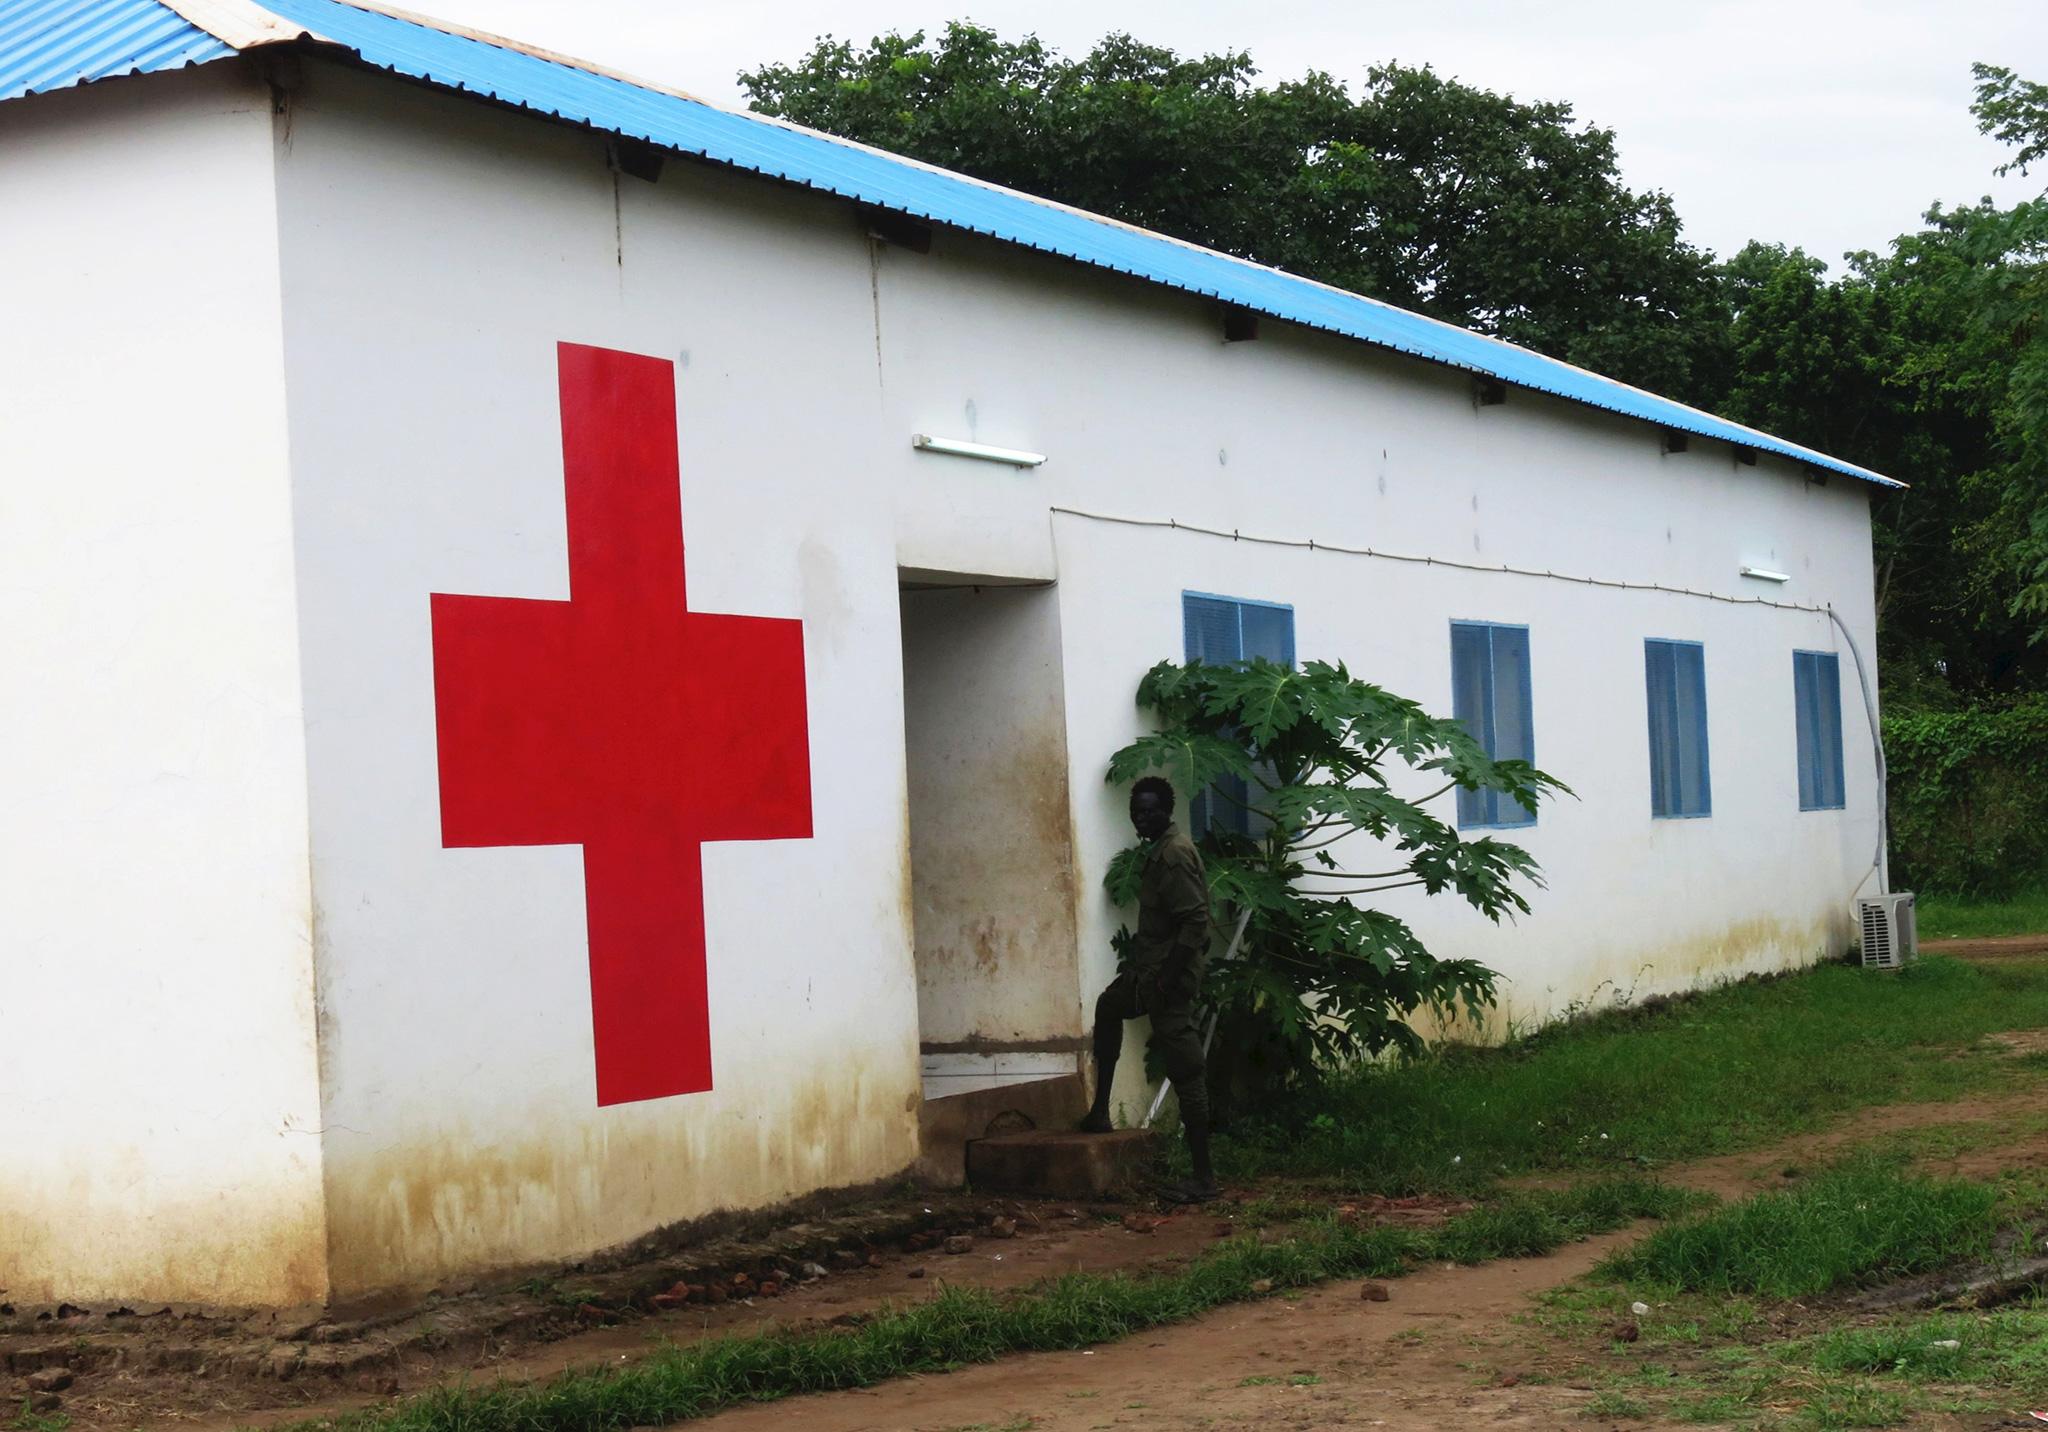 south-sudan-01-mobile-surgical-teams-ss-e-00704-150825.jpg